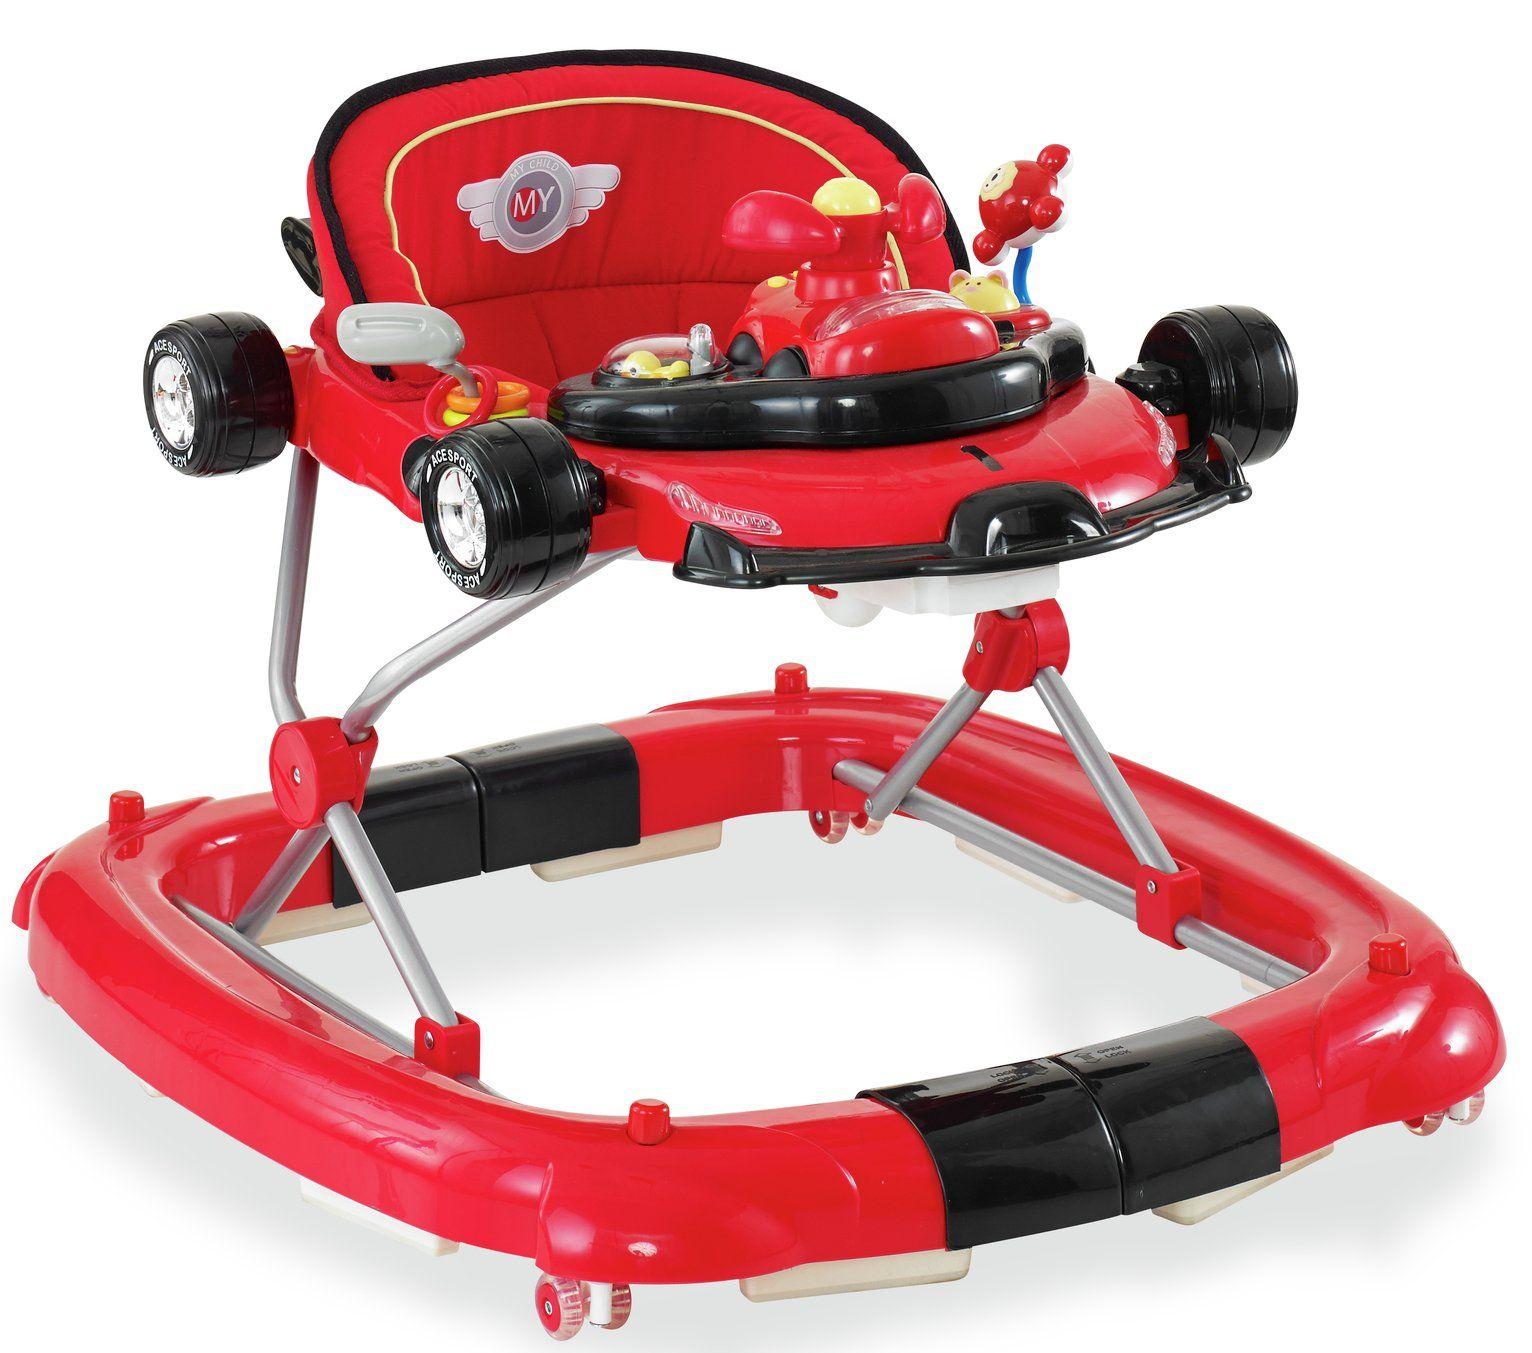 Mychild F1 2 in1 Car Walker Racing Red